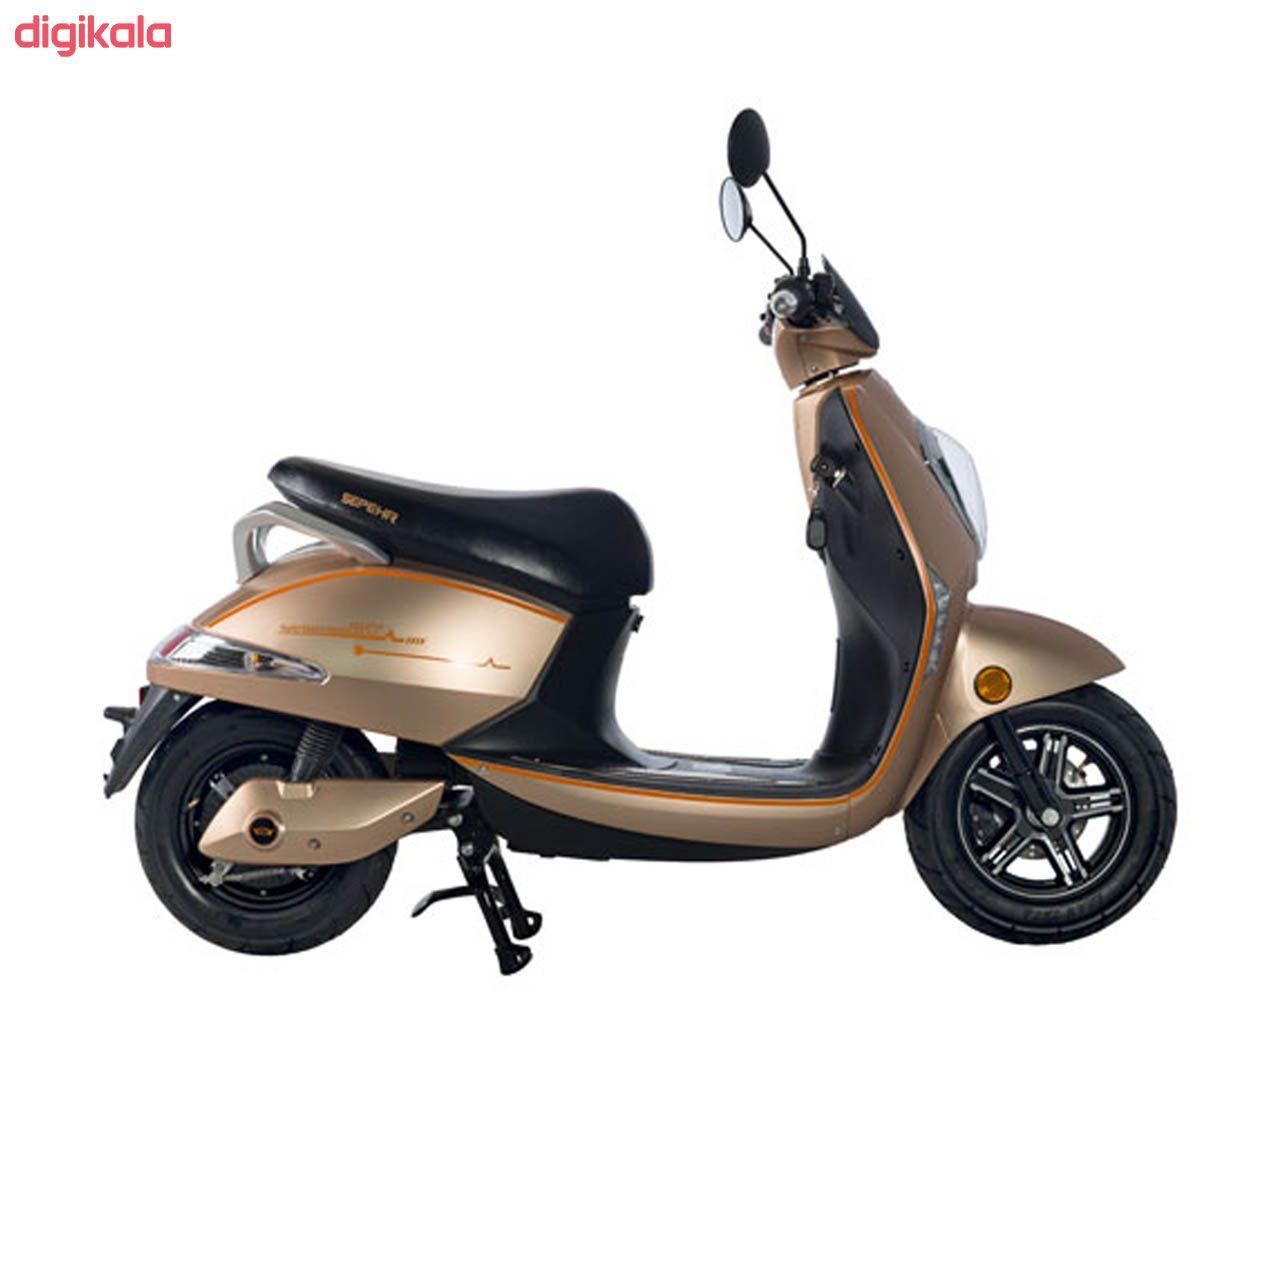 موتورسیکلت سپهر مدل 1600SKZ وات سال 1399 main 1 1